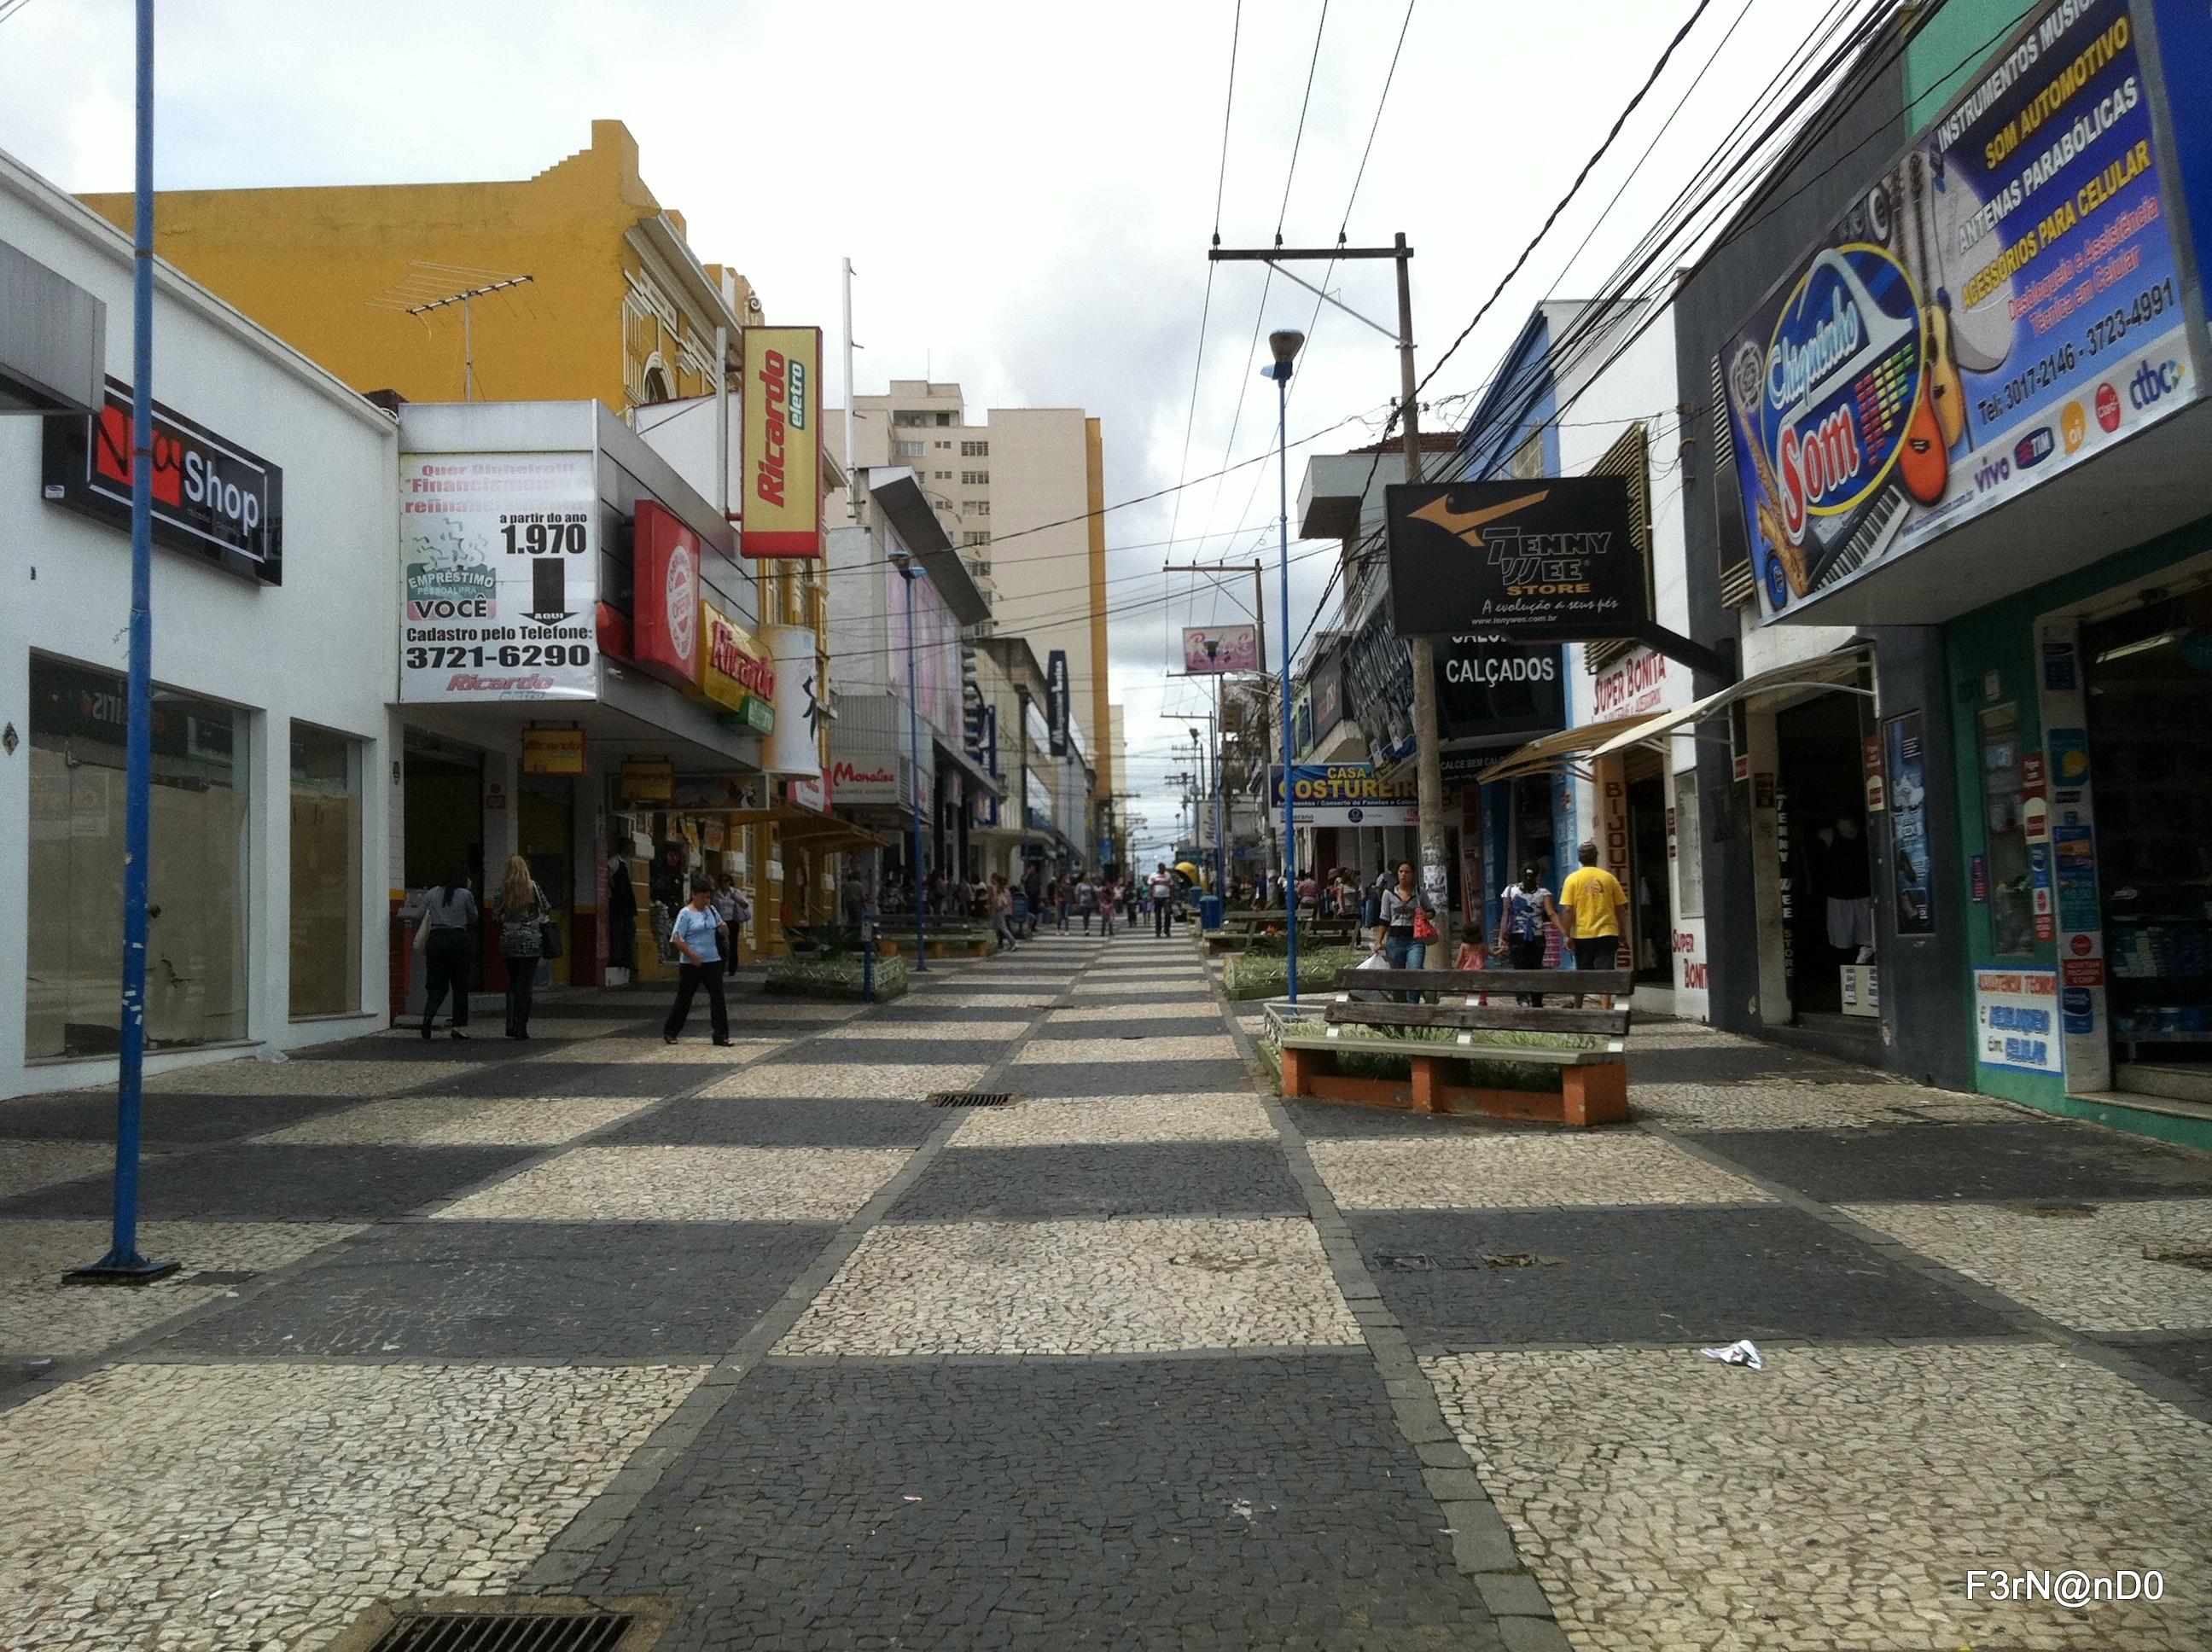 Franca São Paulo fonte: upload.wikimedia.org